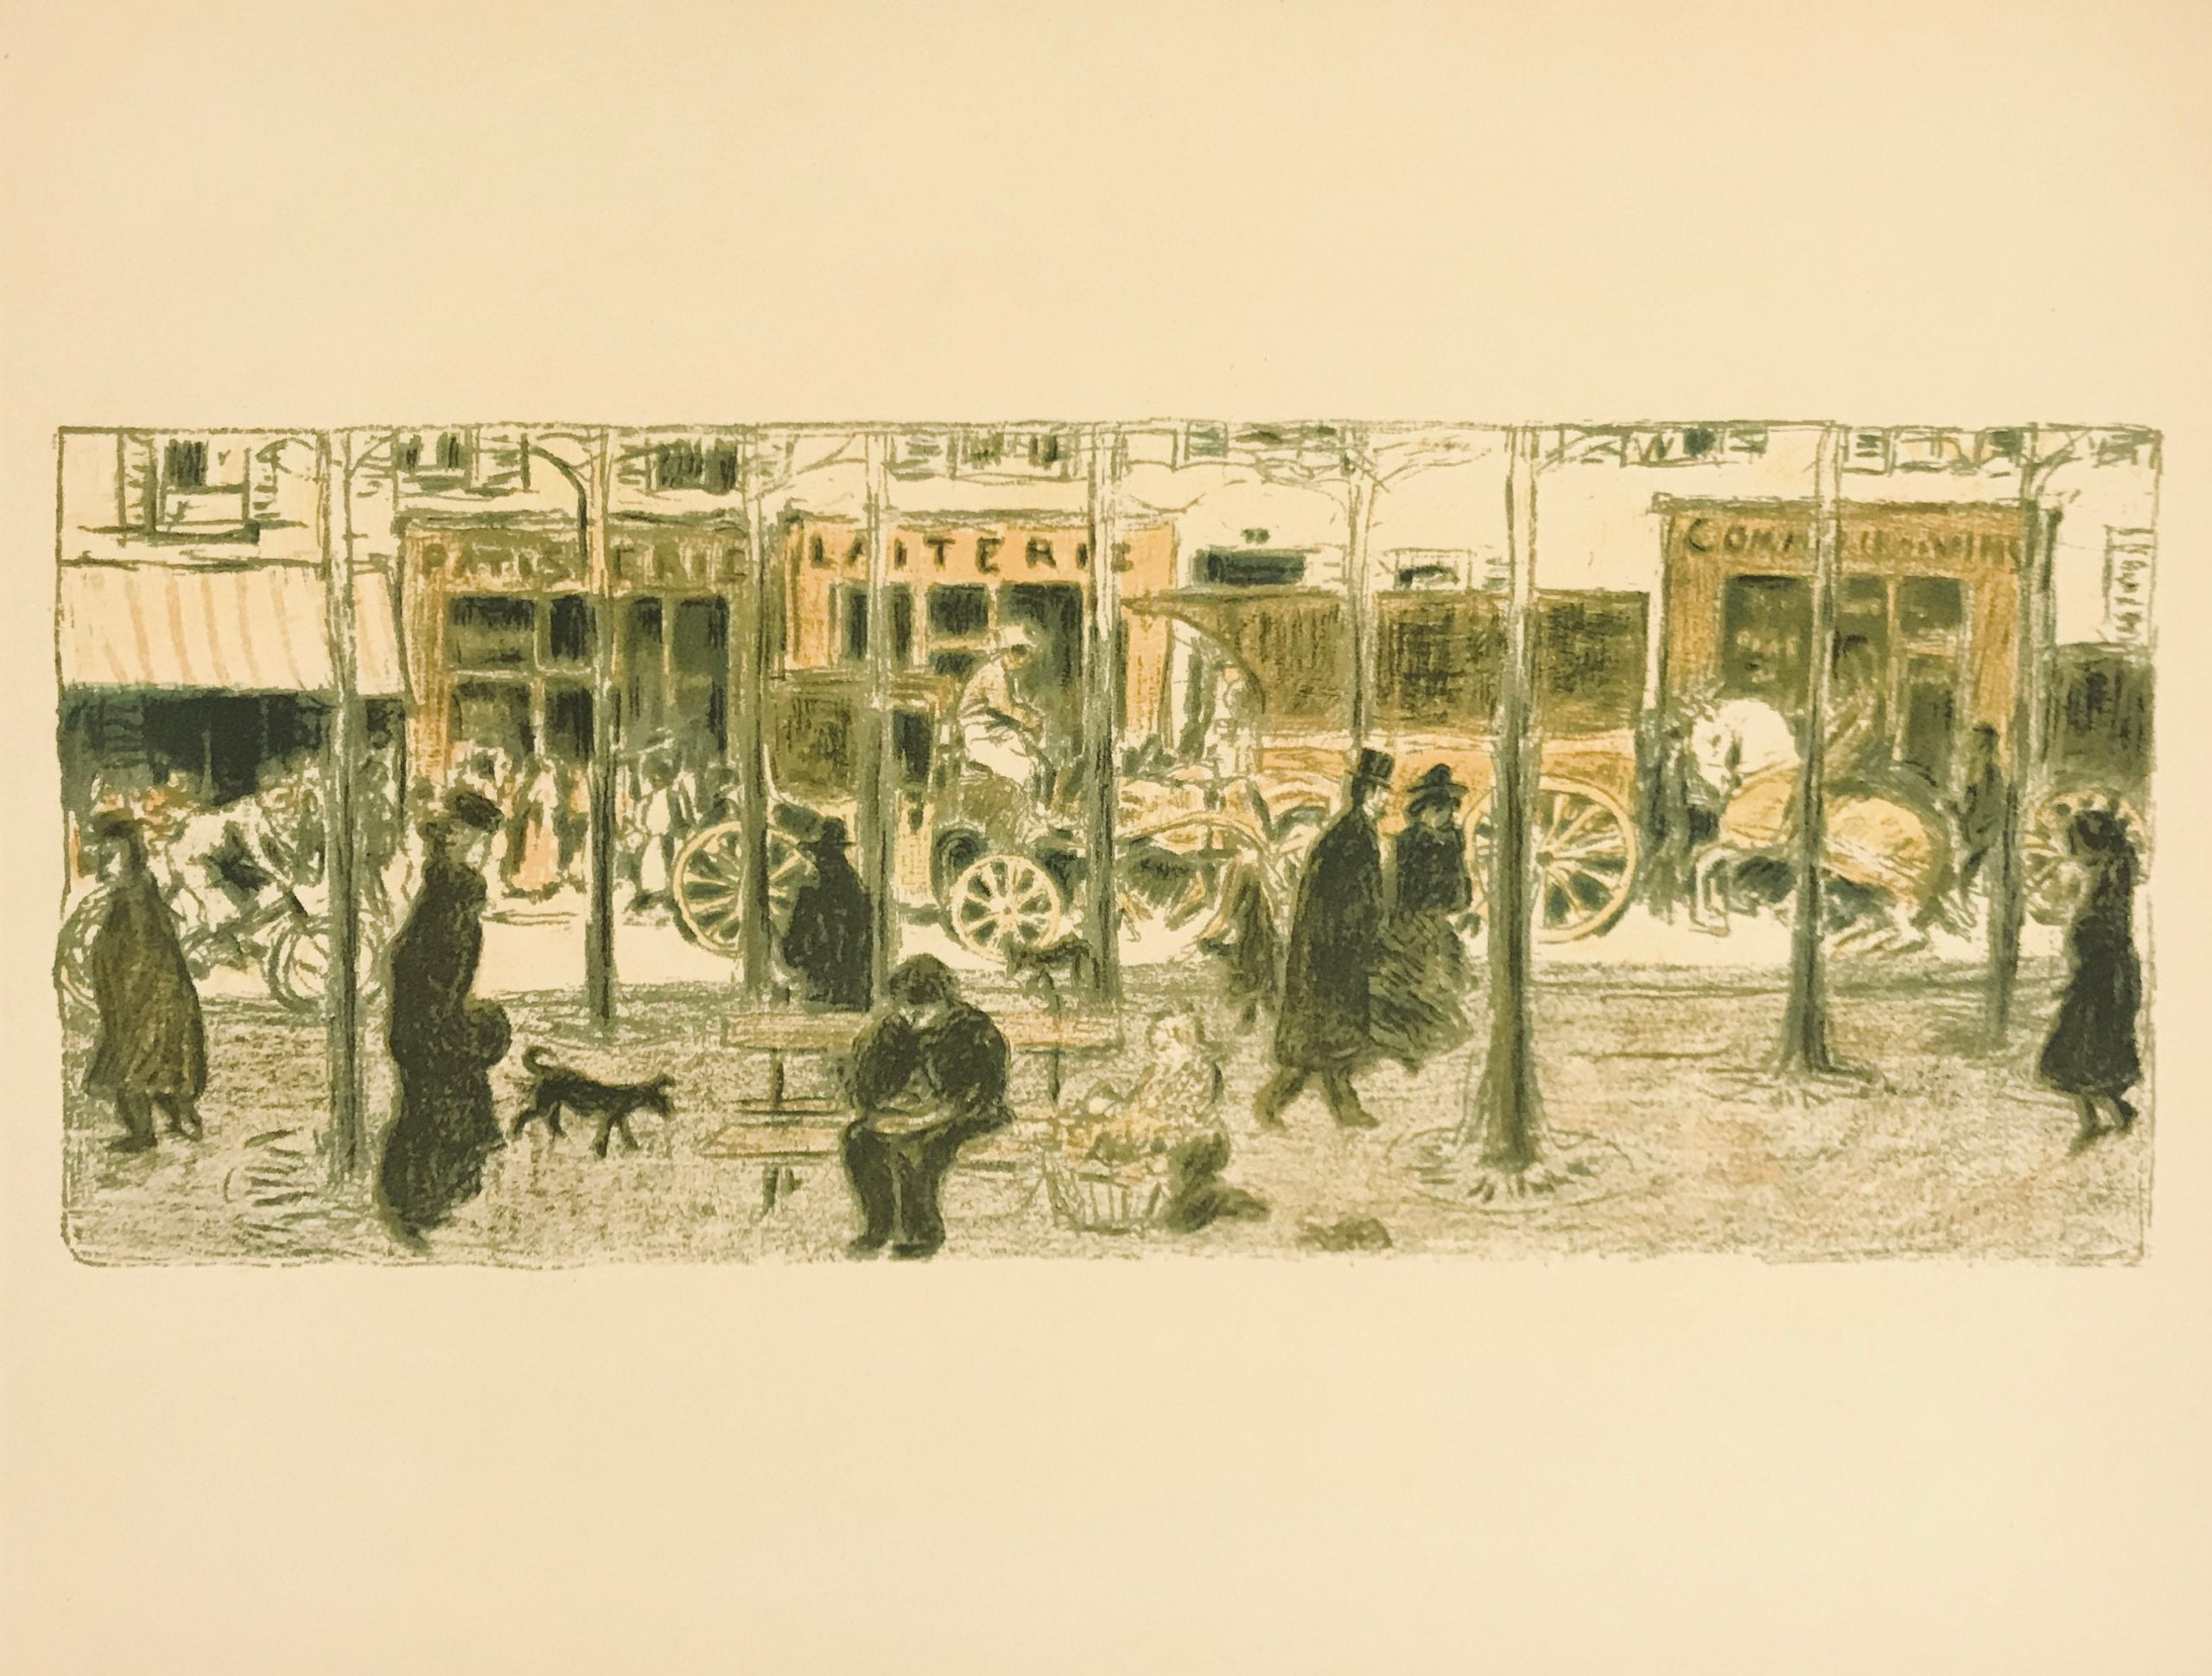 Bonnard Lithograph 61, Le Boulevard 1952